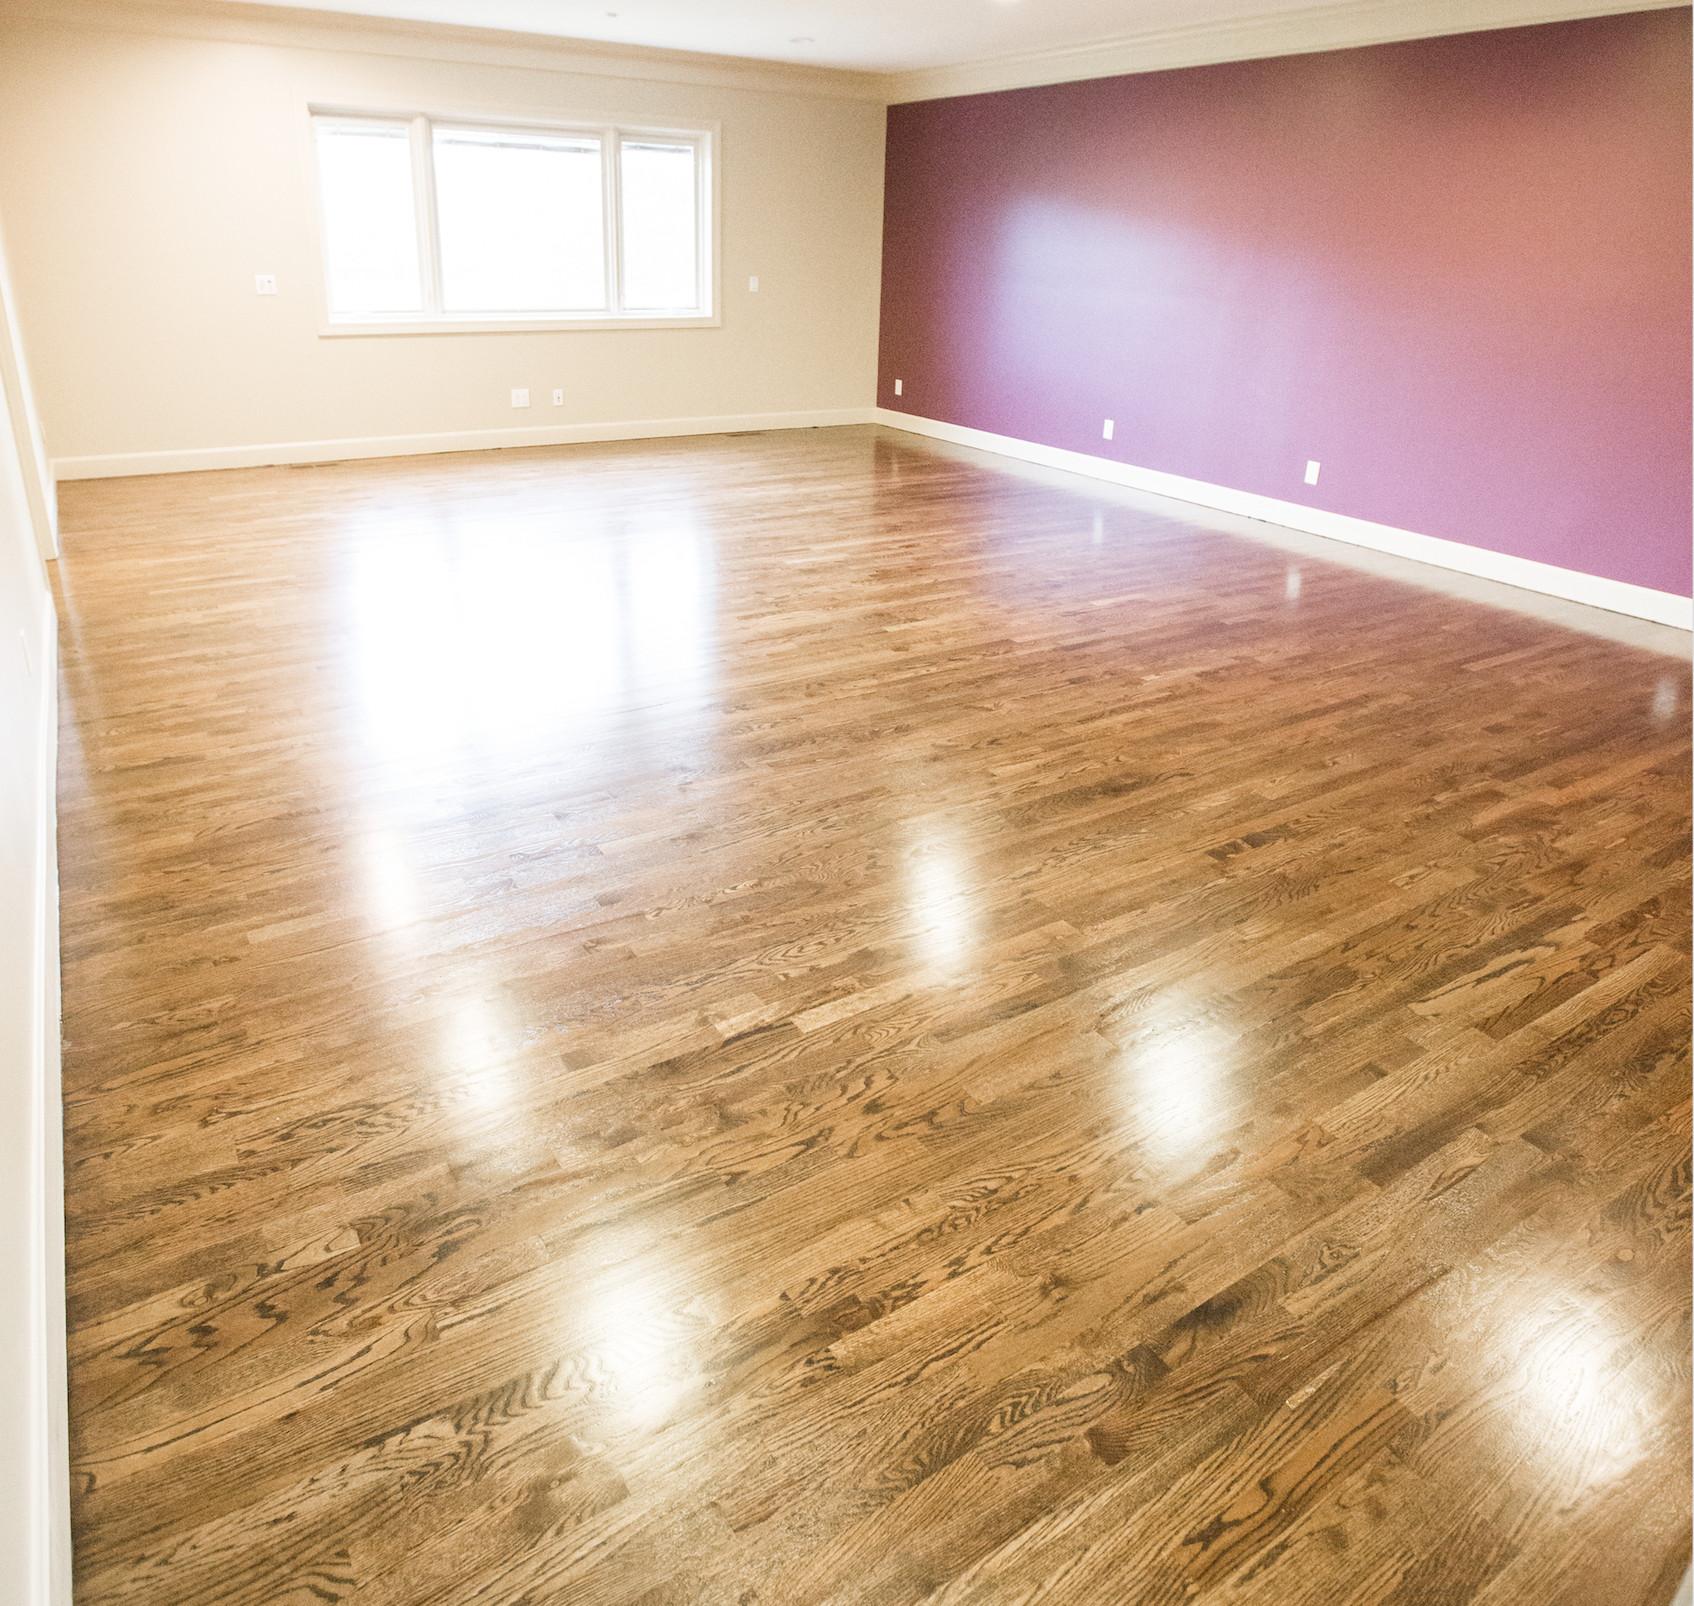 hardwood floor refinishing raleigh of floor refinishing company hardwood floors service by cris floor with floor refinishing company pin by rippnfinish on dark hardwoods